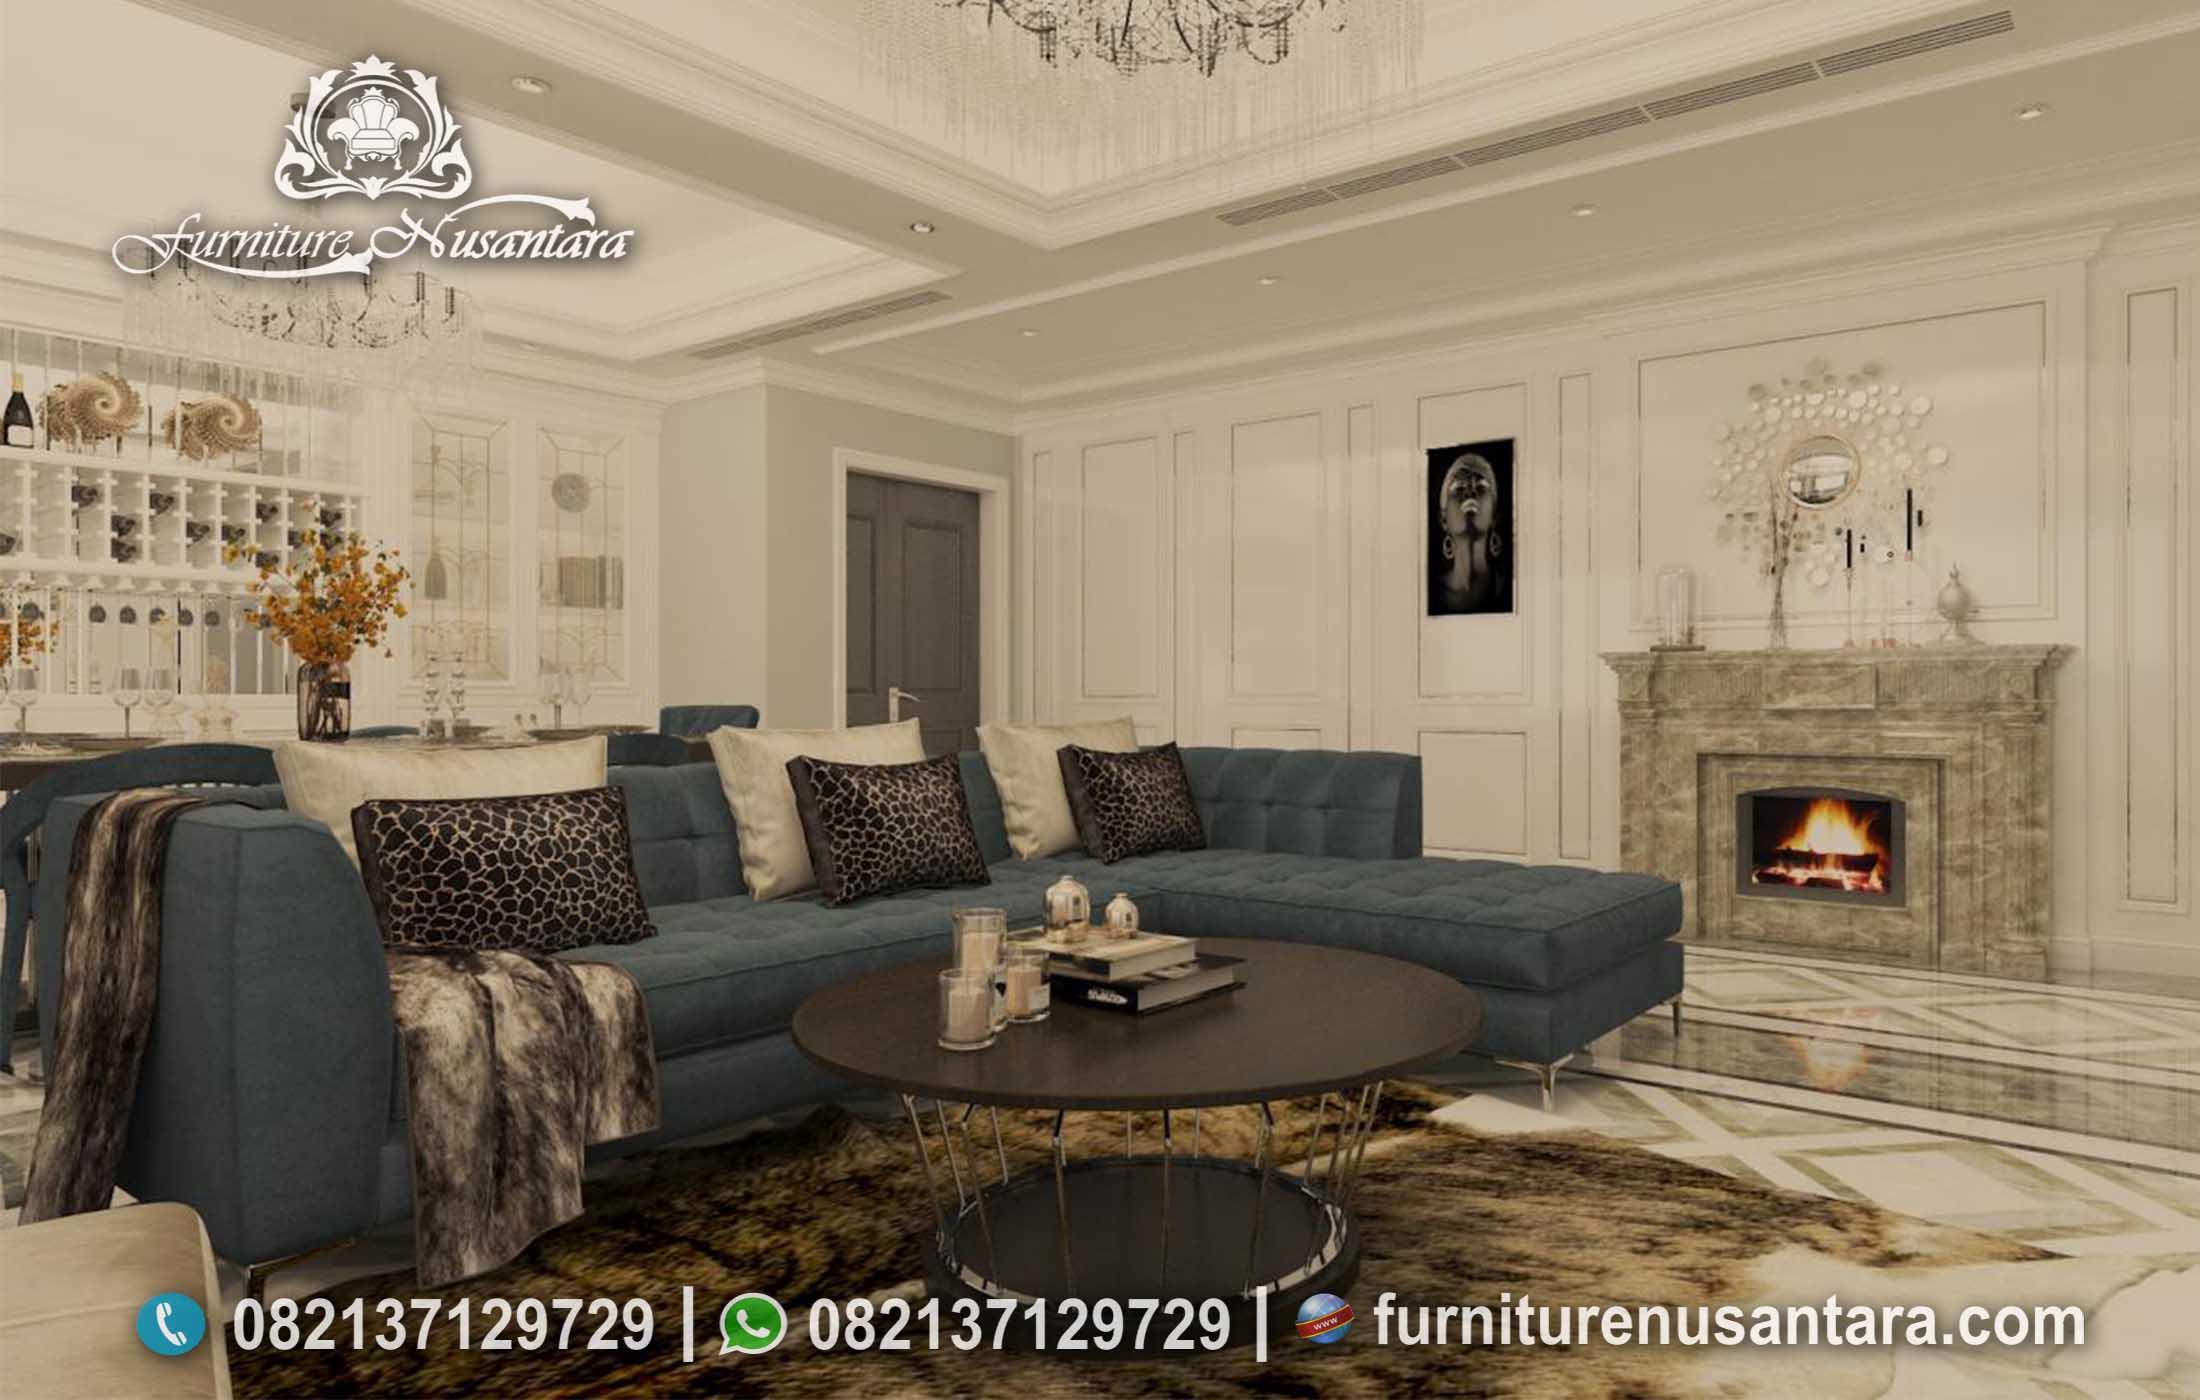 Sofa Minimalis Modern Hijau Tosca ST-03, Furniture Nusantara